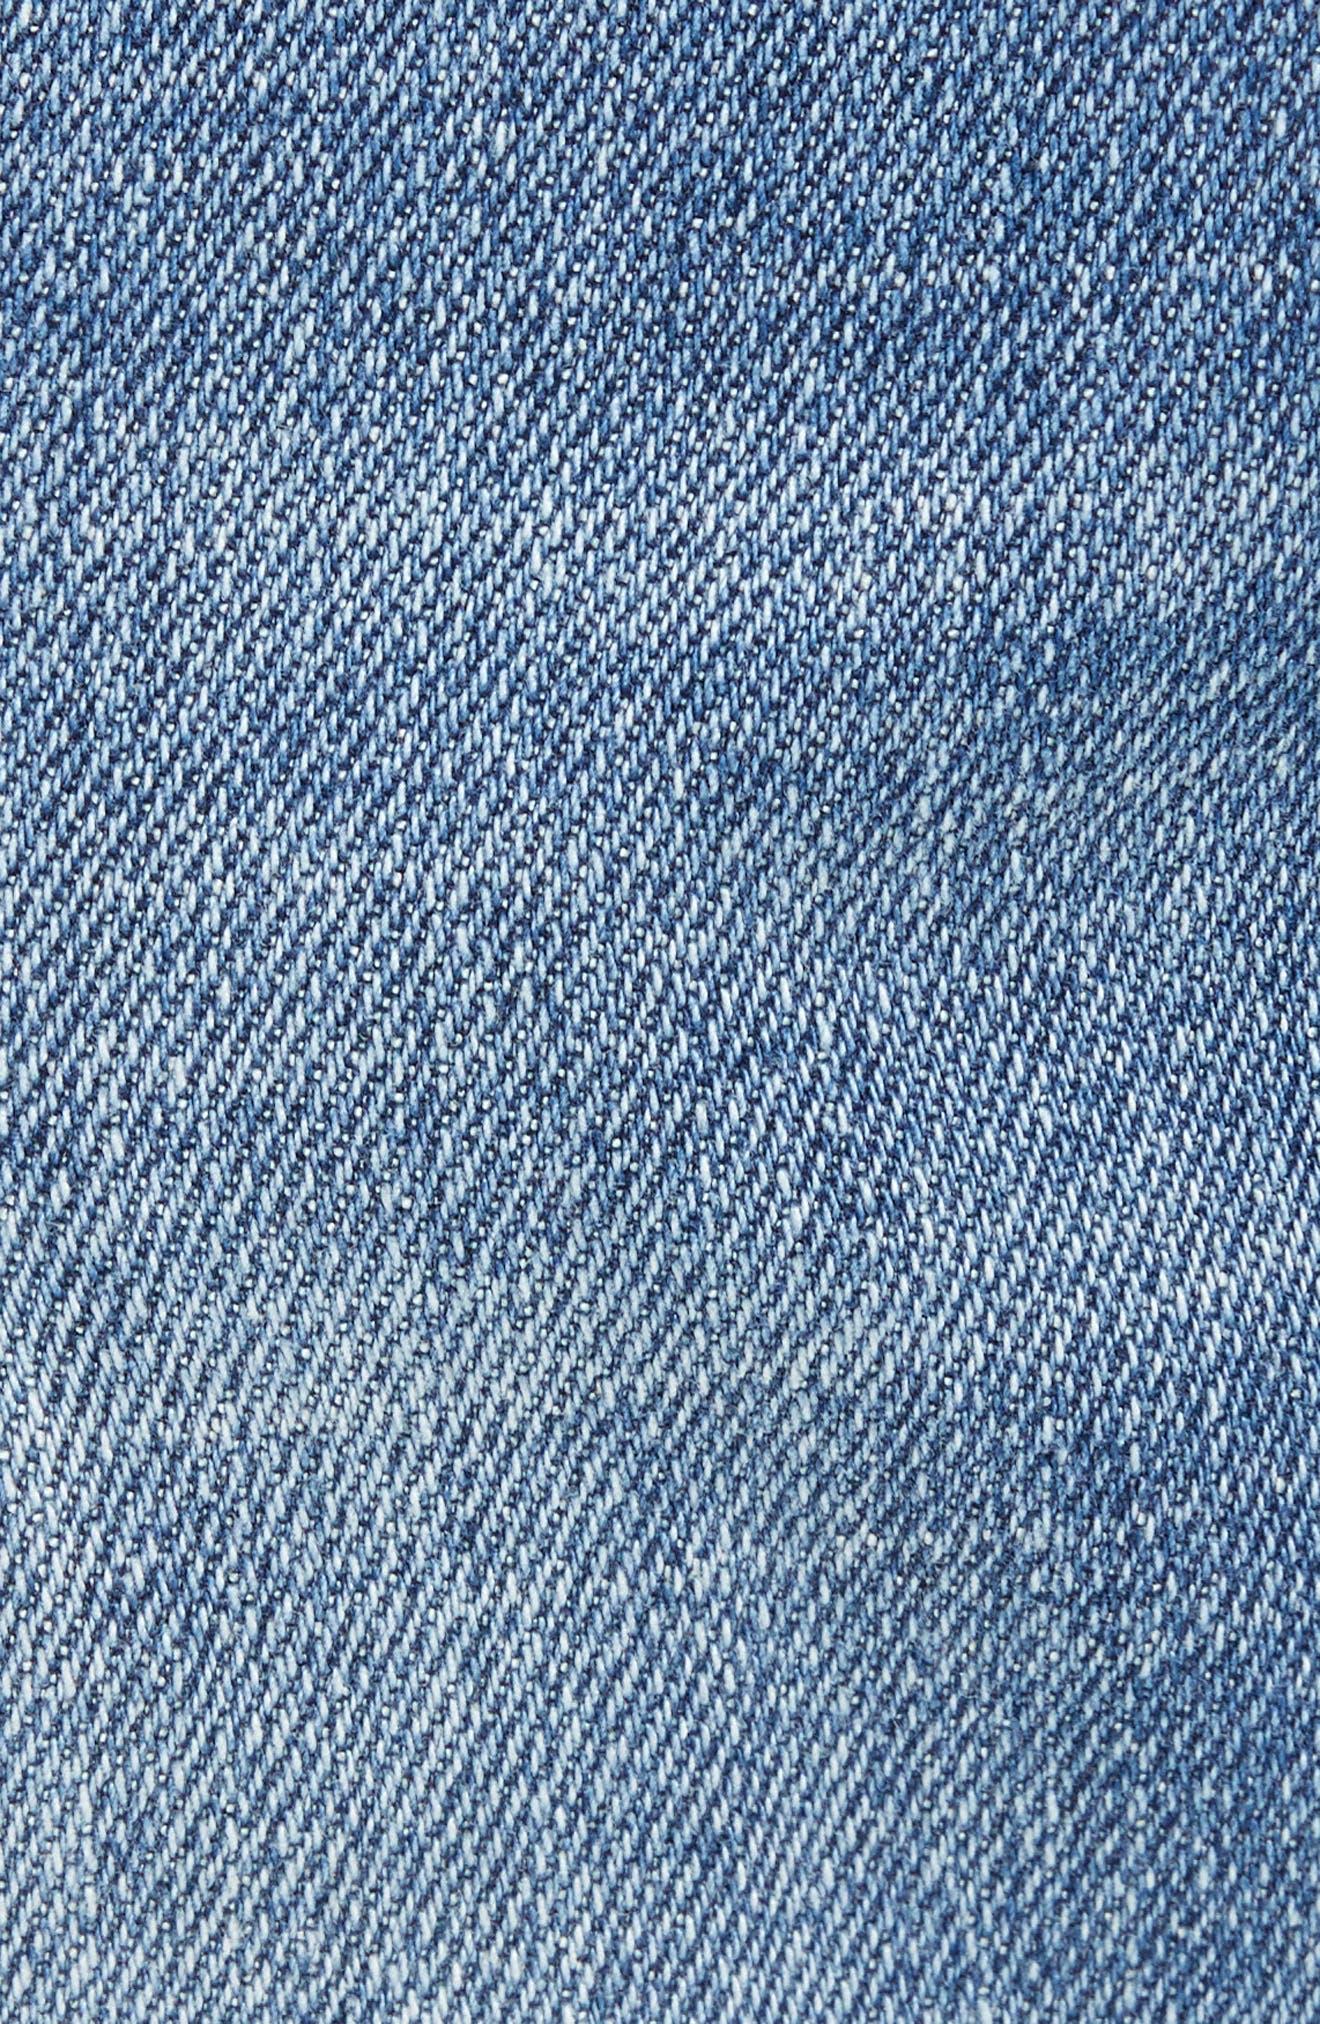 Rip & Repair Stretch Slim Jeans,                             Alternate thumbnail 5, color,                             BLUE HETFIELD WASH